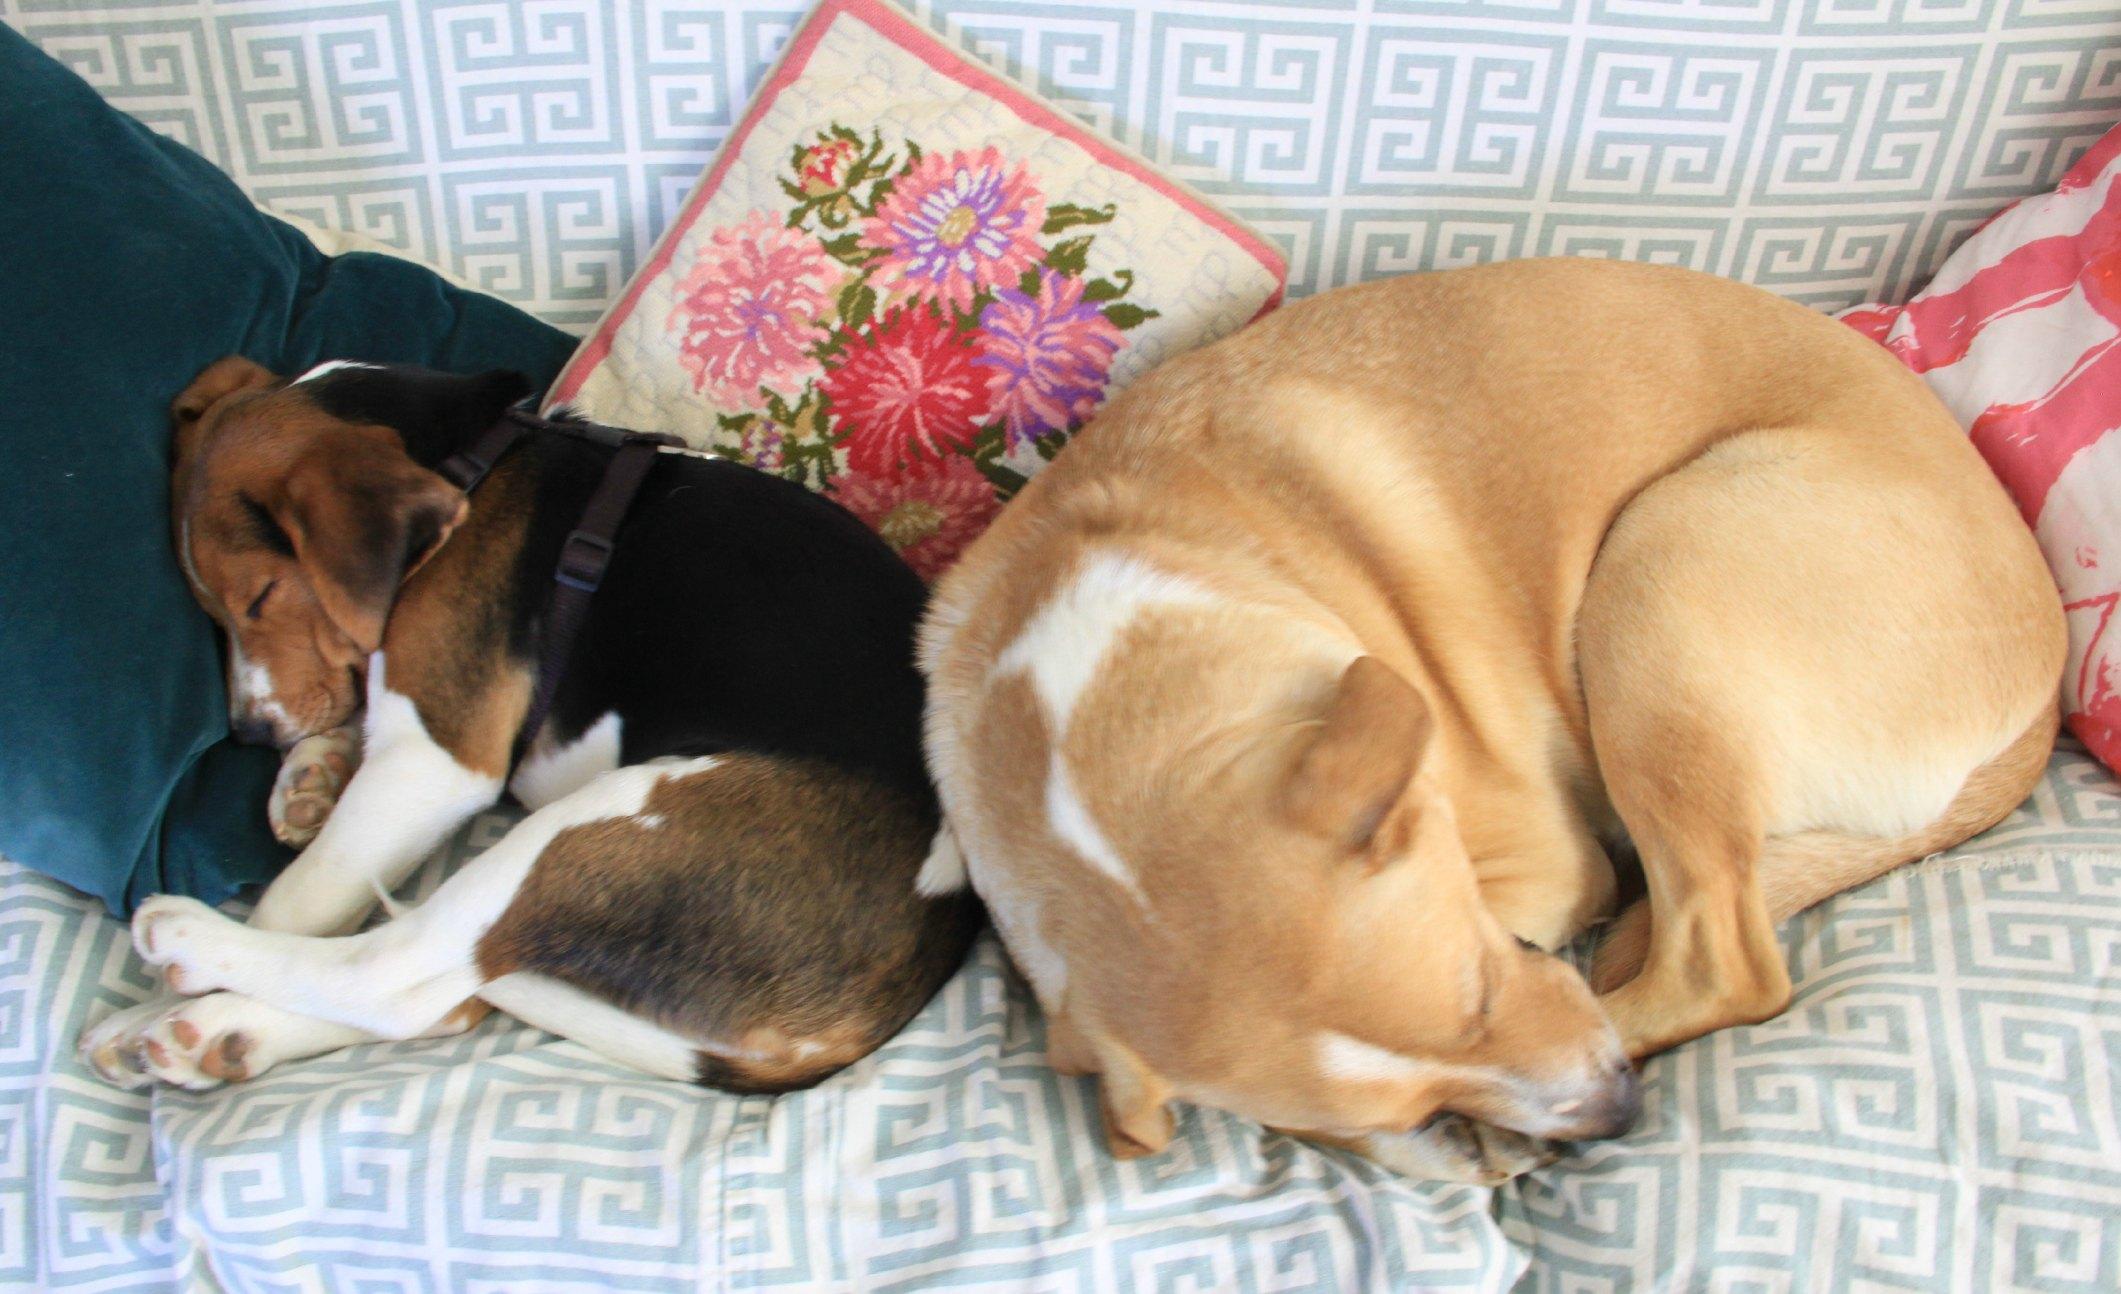 BEAN AND CHARLIE MAKE SLEEP LOOK SO GOOD